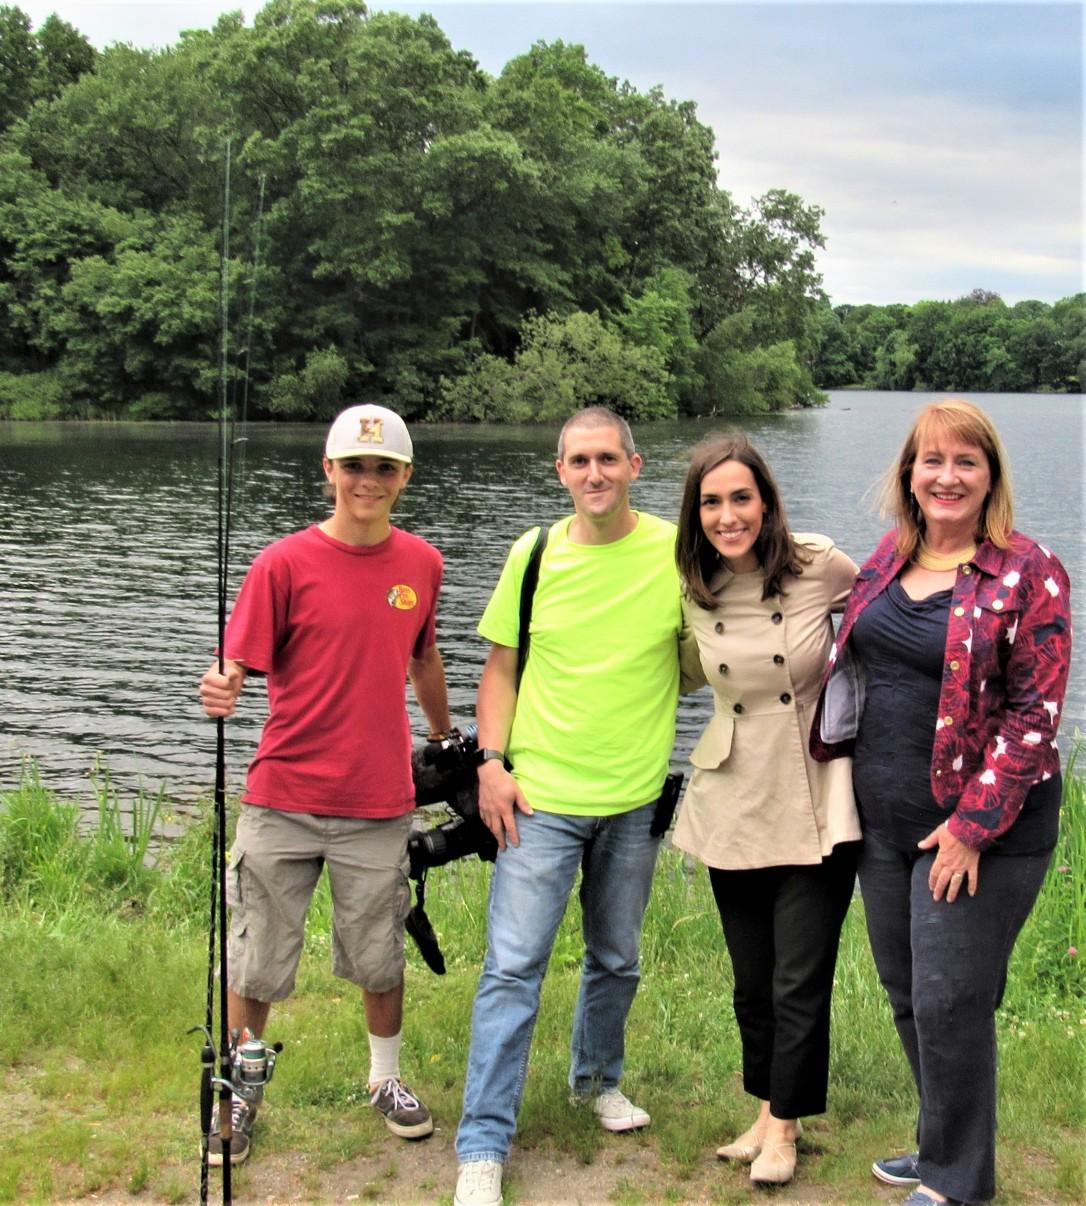 IMG_9912 (3) HAV Alison Colby-Campbell Plug pond with Josh Penney 17yo Fox 25 Shawn Denoncour Christine McCarthy and Alison Colby-Campbell